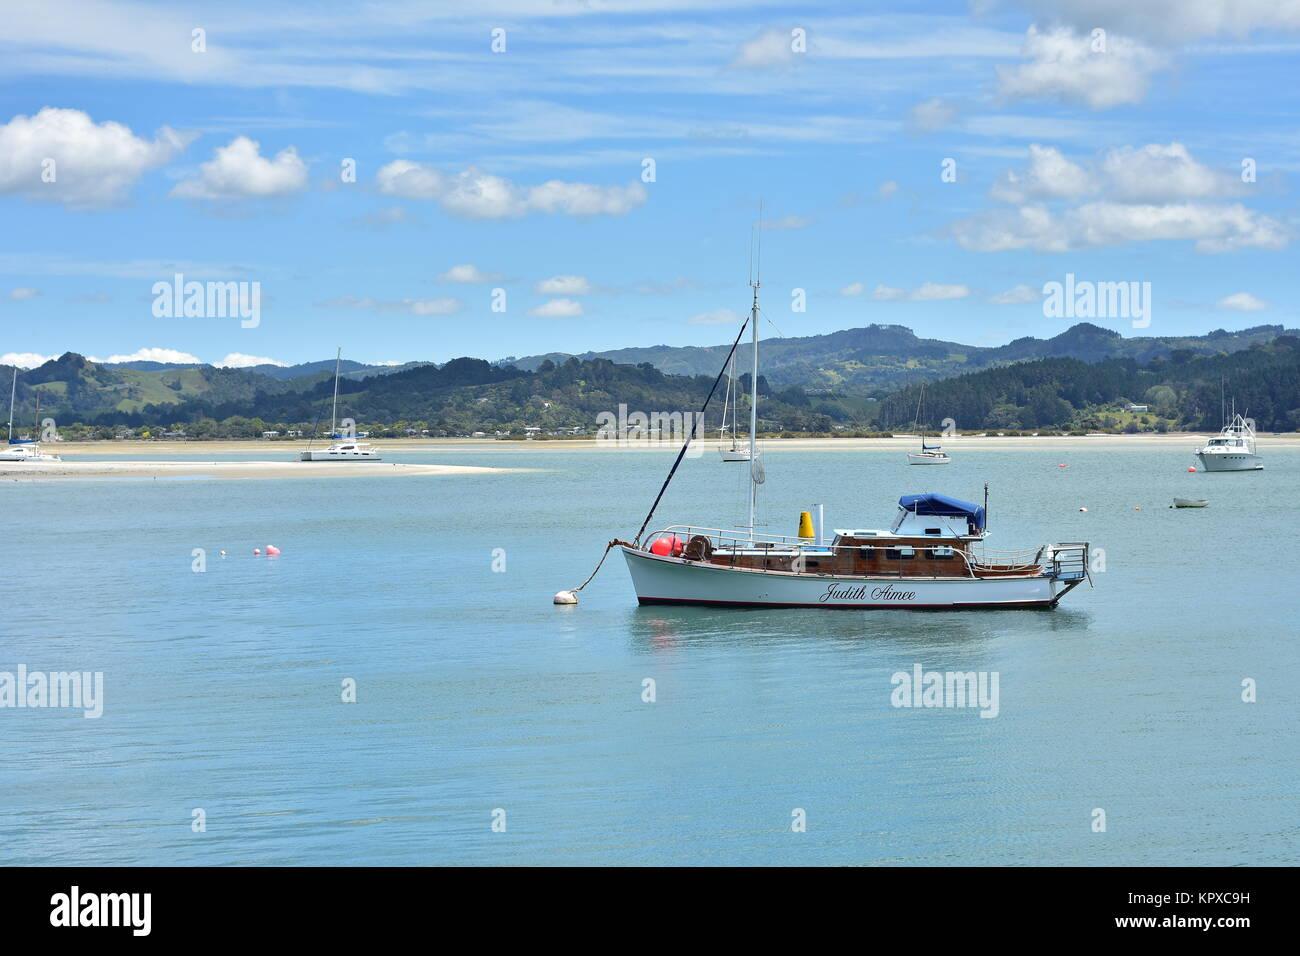 Yacht On Mooring Buoy In Stock Photos & Yacht On Mooring Buoy In Stock Images - Alamy